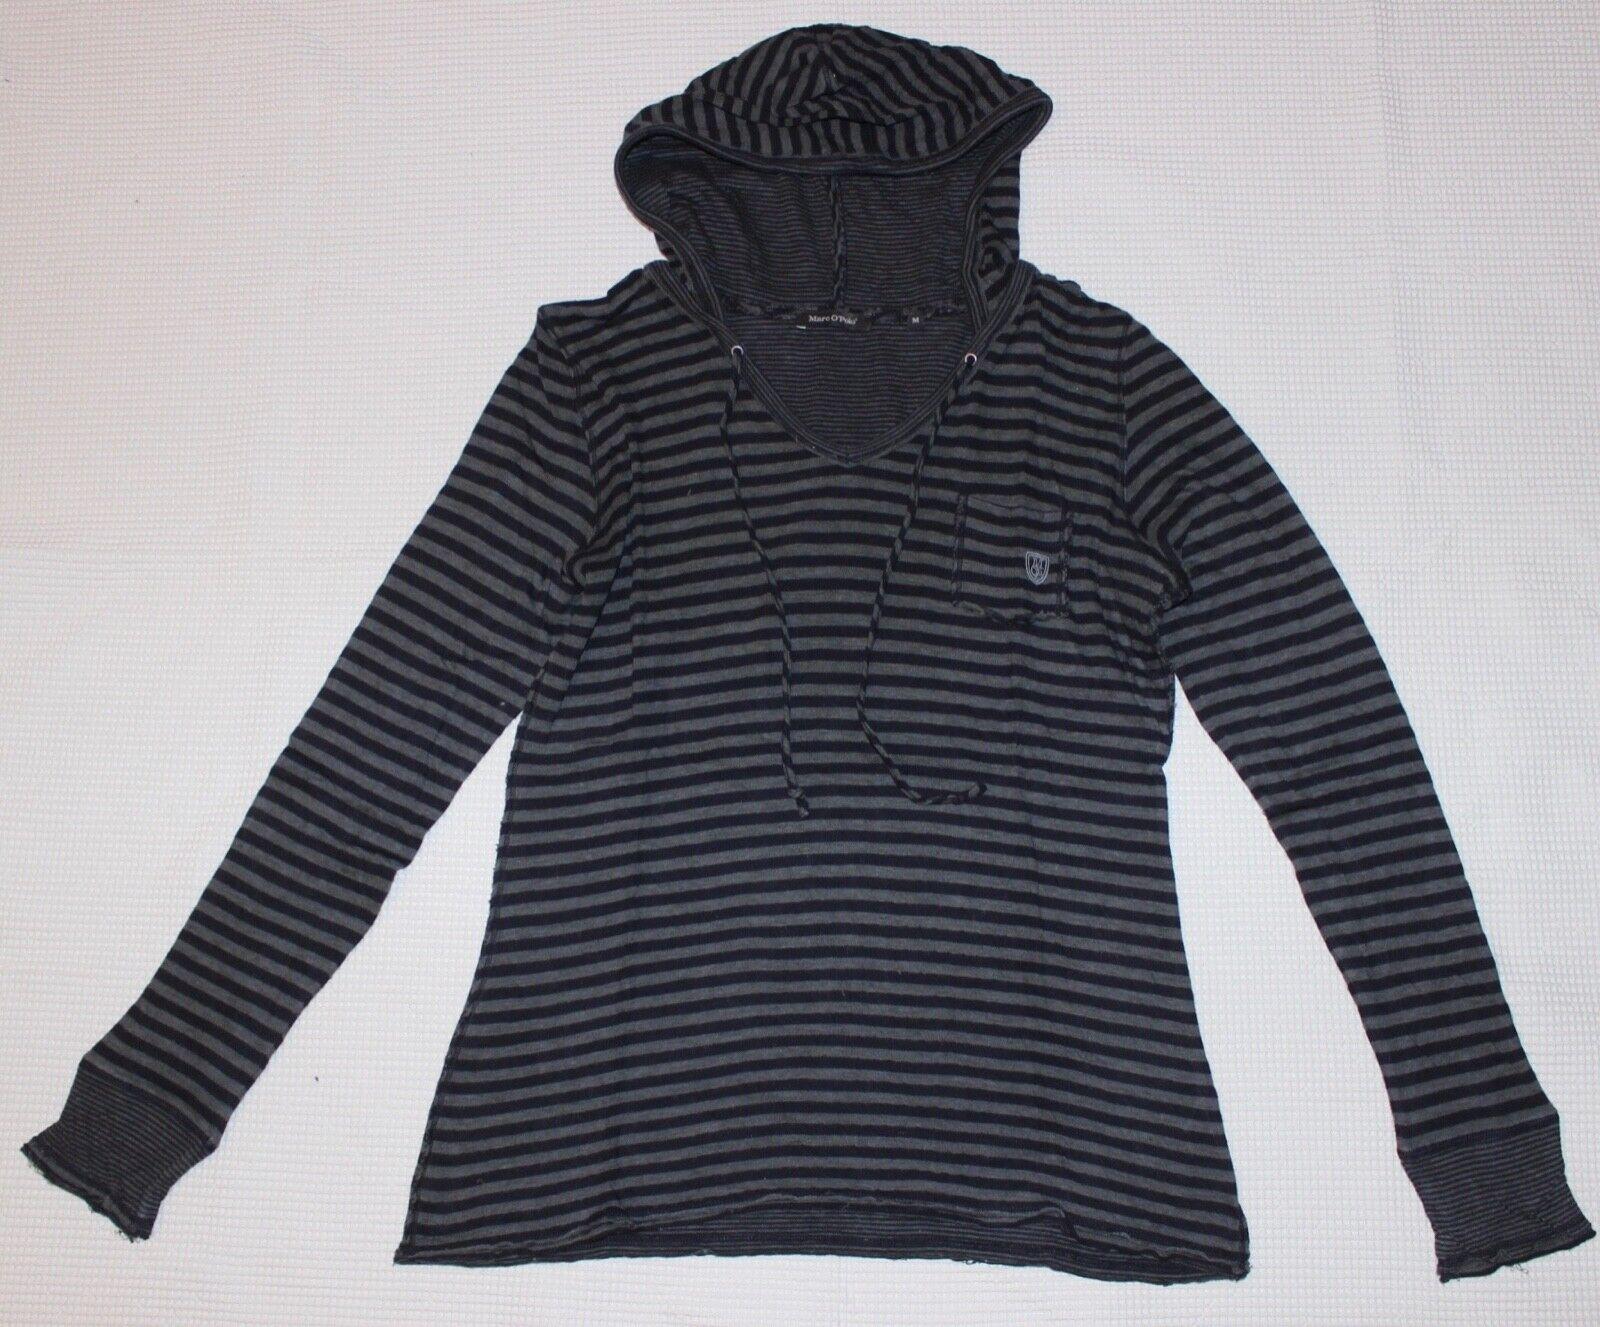 48b055fa1f Marc O`Polo Hoodie Kapuzensweatshirt schwarz-grau-gestreift Gr. M Vintage